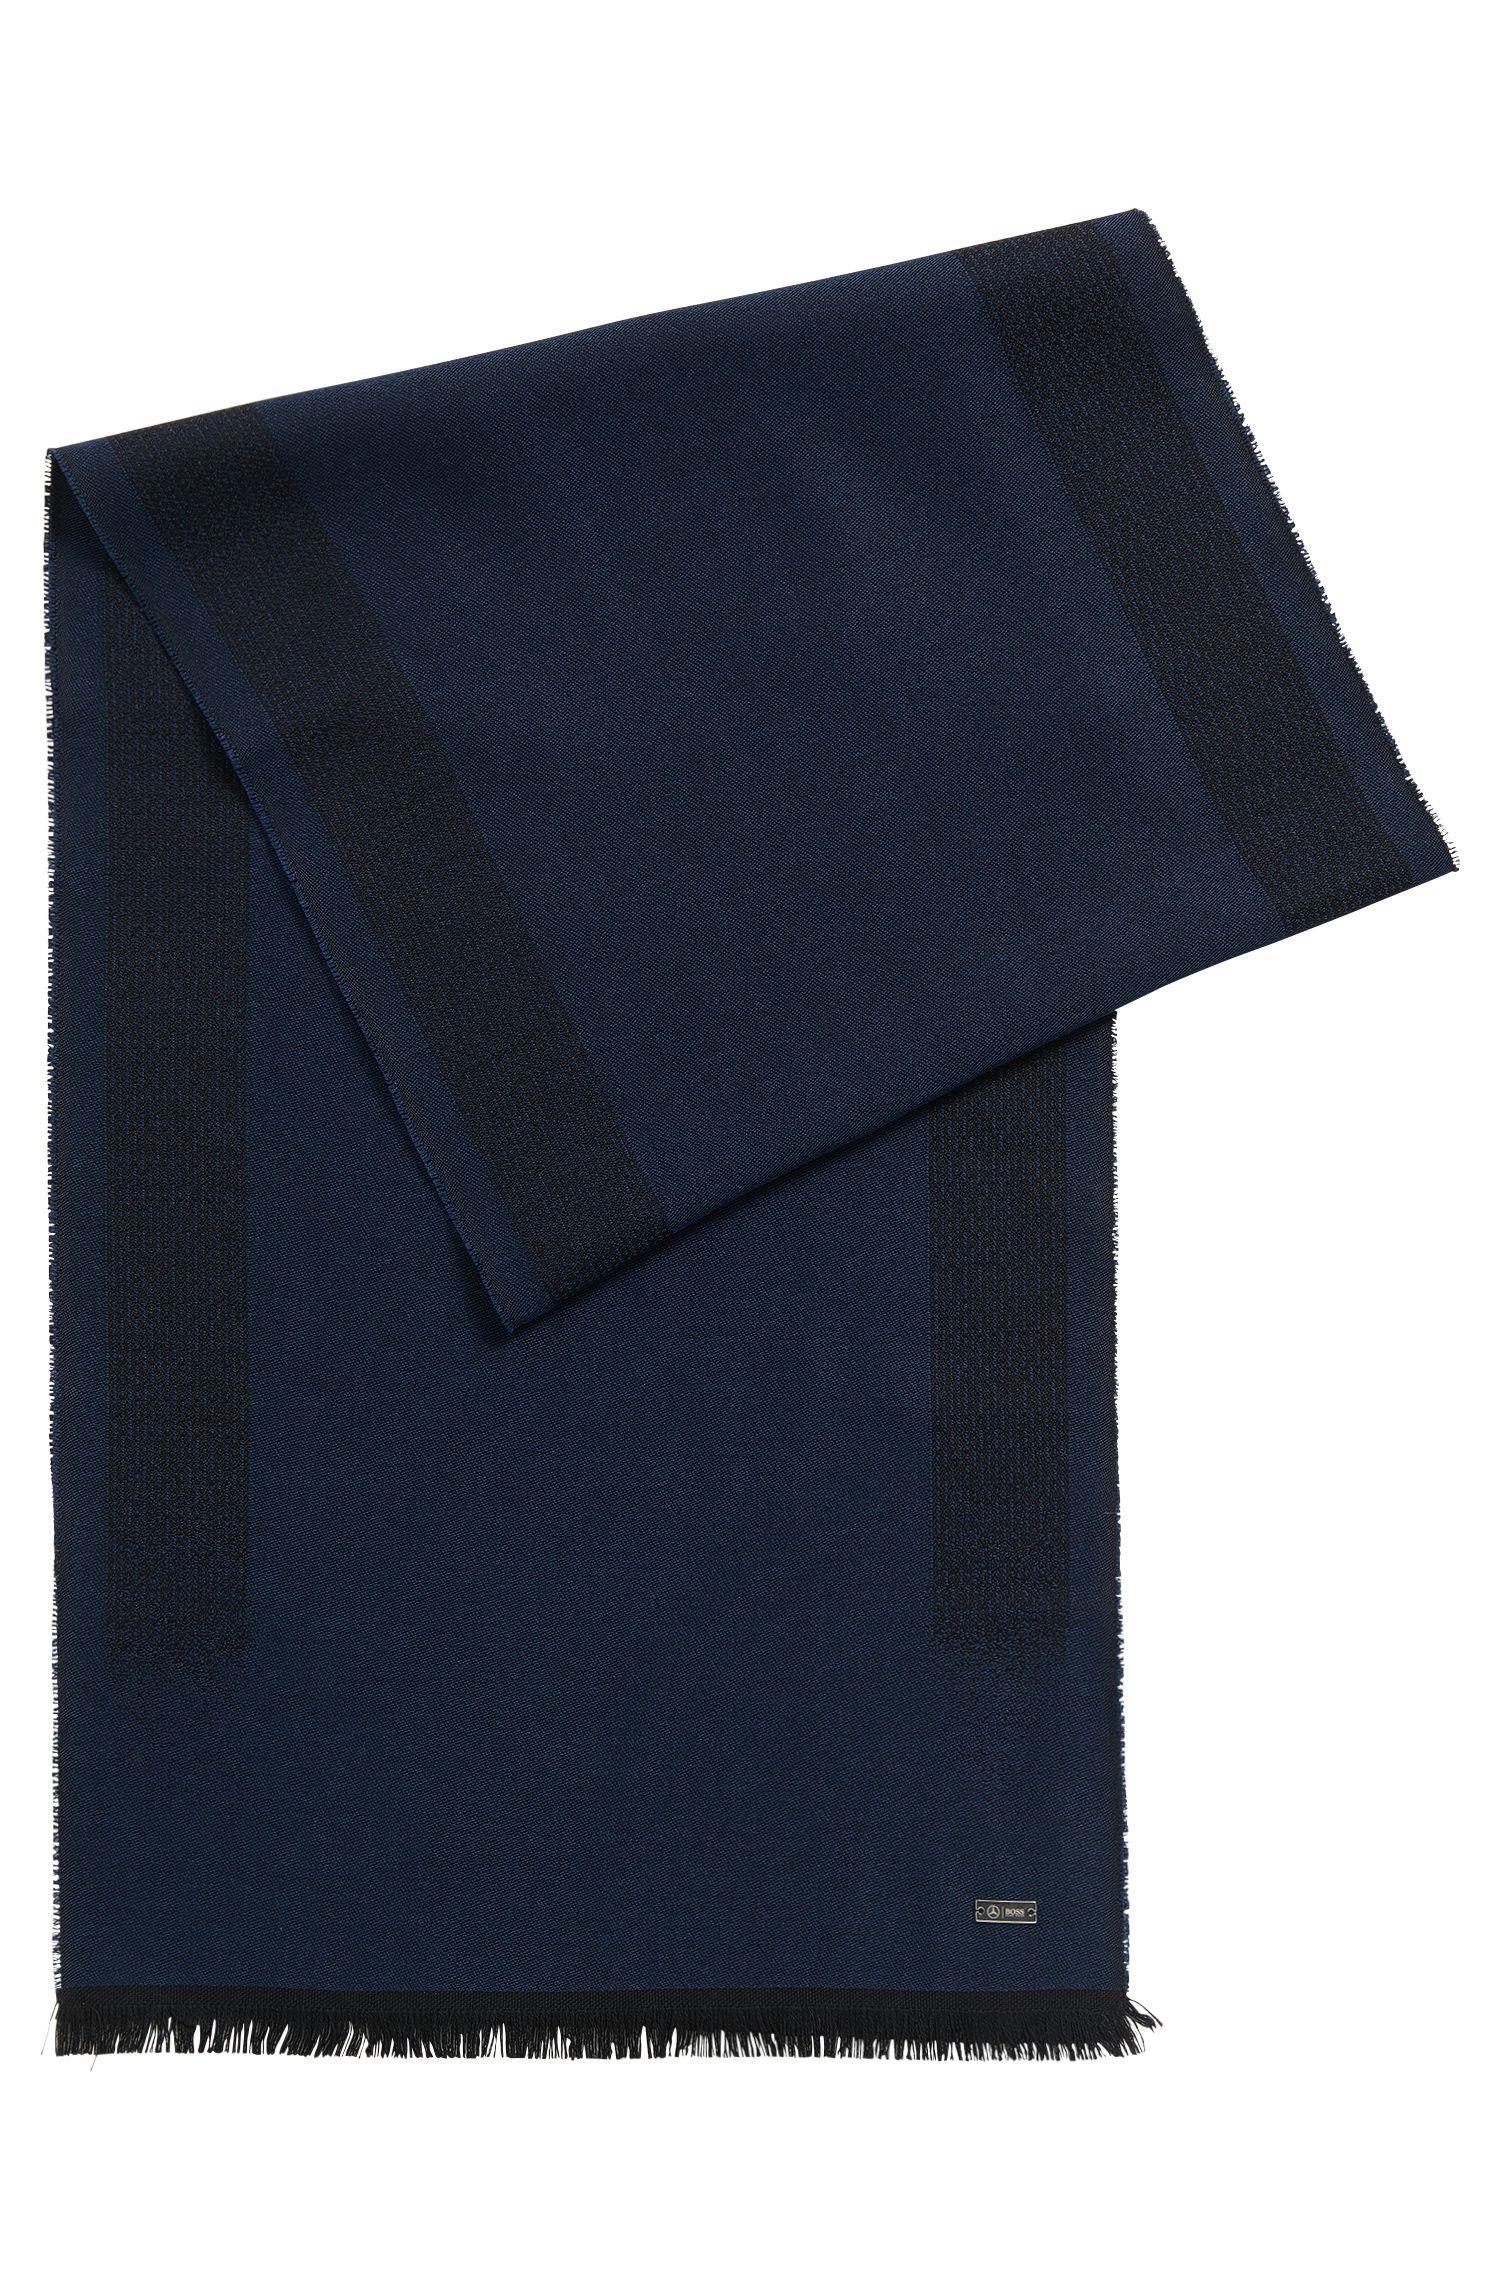 Leichter Schal aus Jacquard